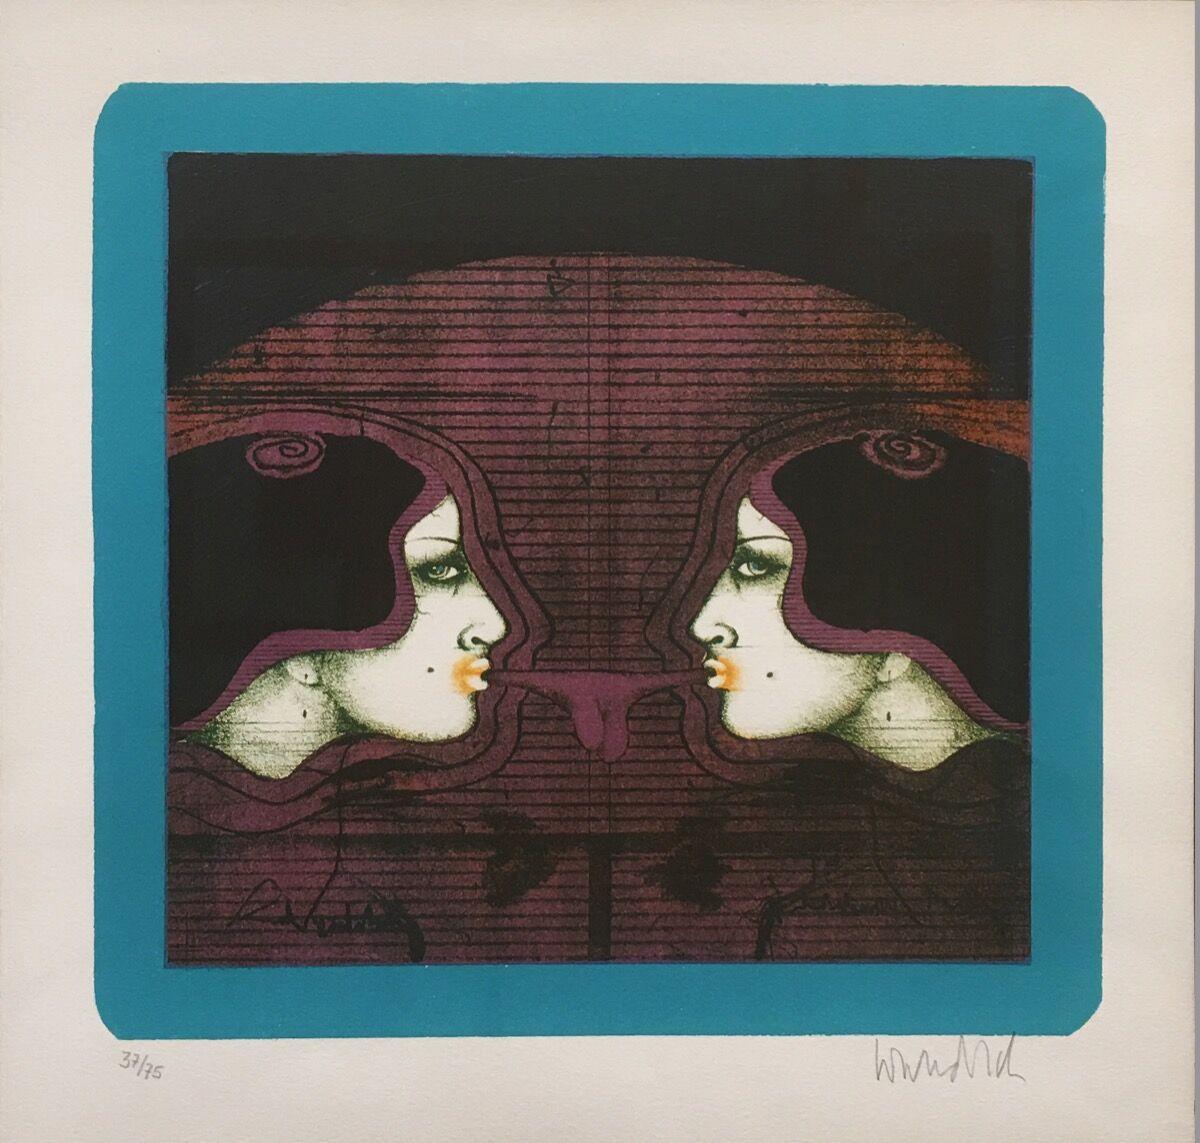 Paul Wunderlich, Bubblegum, 1967. Courtesy of The Redfern Gallery Ltd.